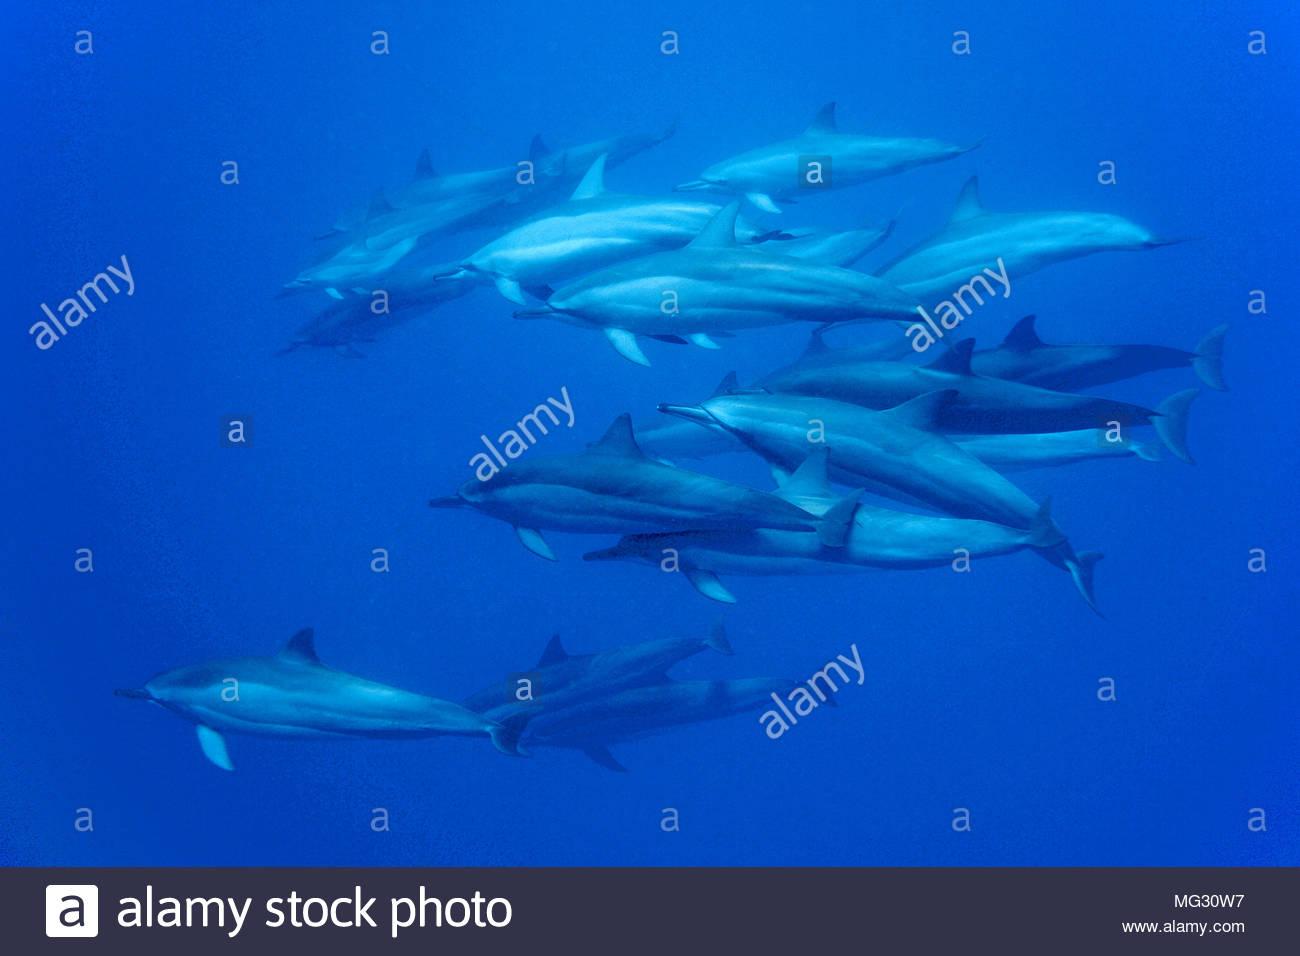 Spinner dolphin (Stenella longirostris), pod of dolphins, National marine sanctuary, Baia dos Golfinhos, Fernando de Noronha, Brazil - Stock Image